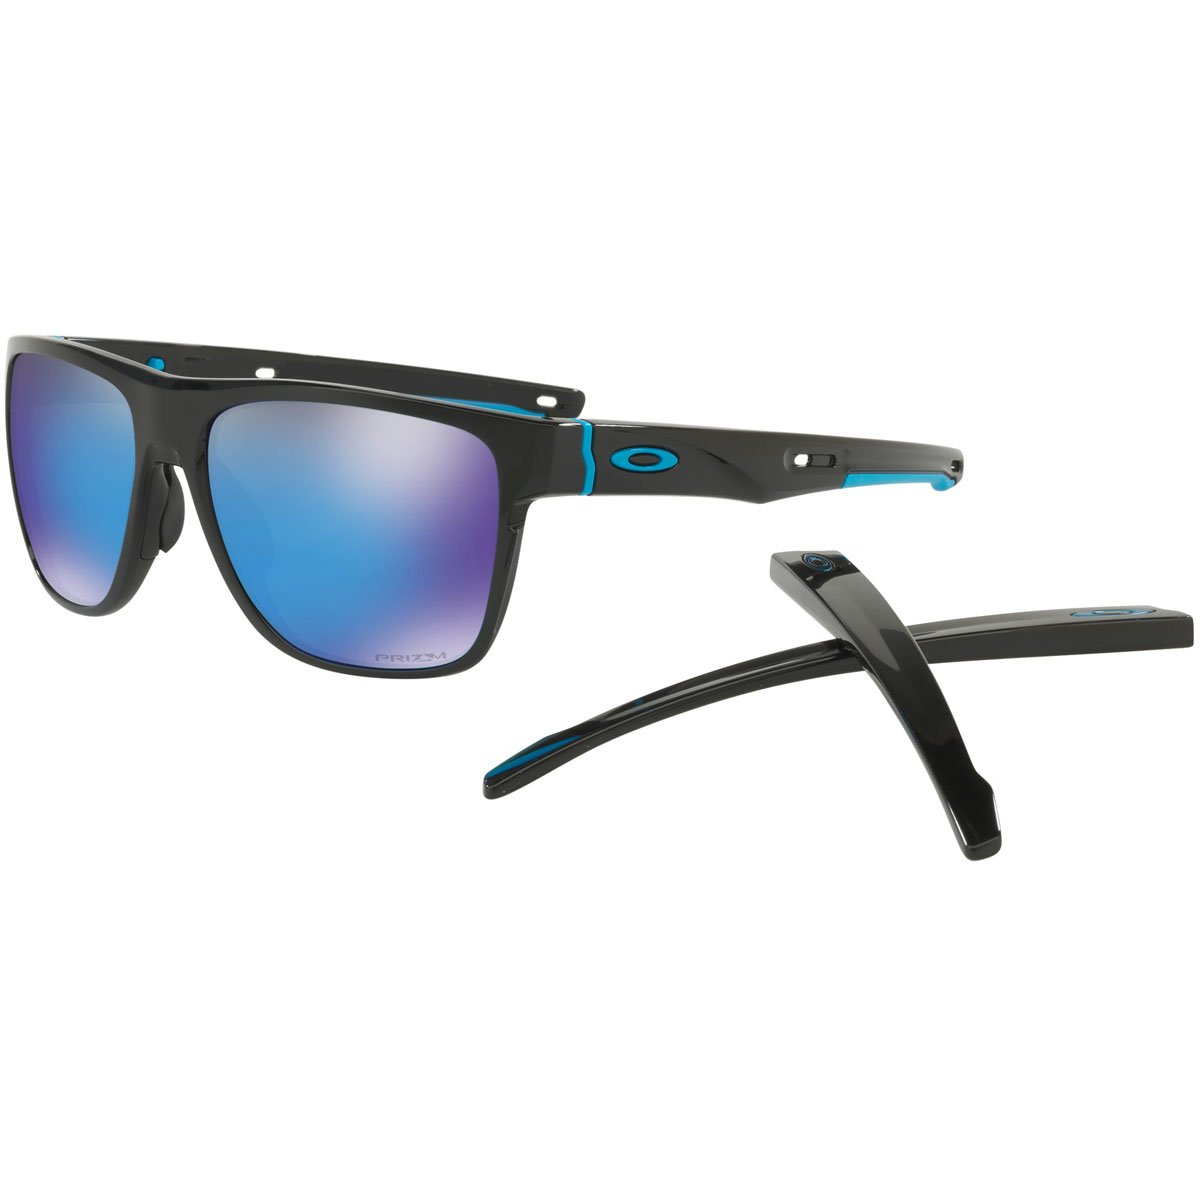 Oakley Men's Crossrange XL Sunglasses, Pol Blk/Przm Sap,OS